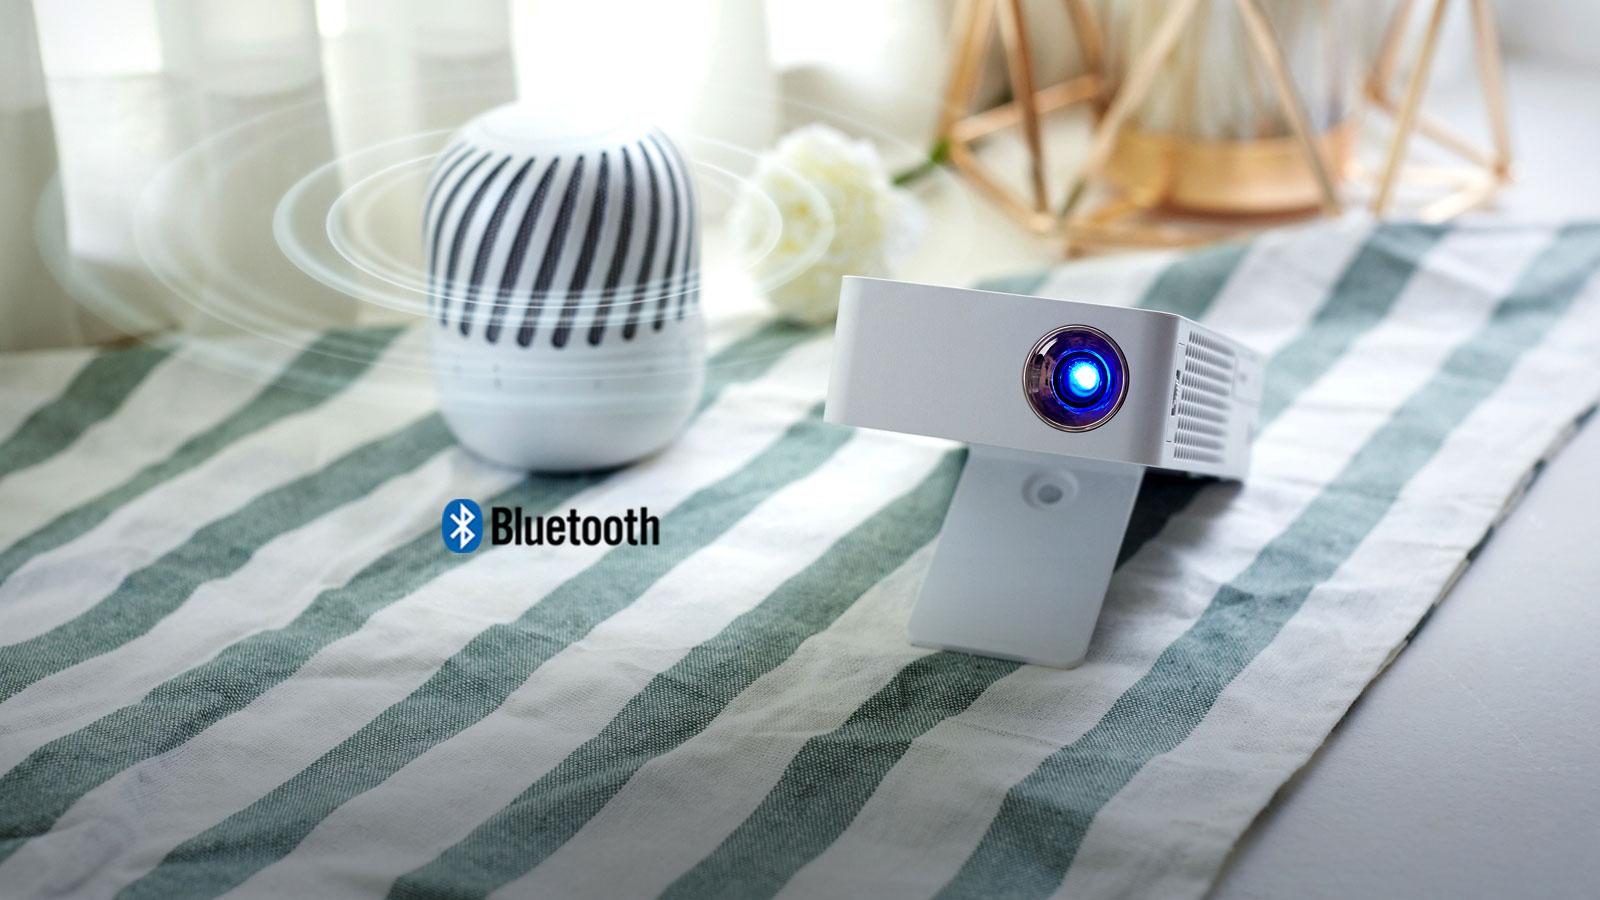 PH30JG_04_PH30JG_Bluetooth_20170919_D4